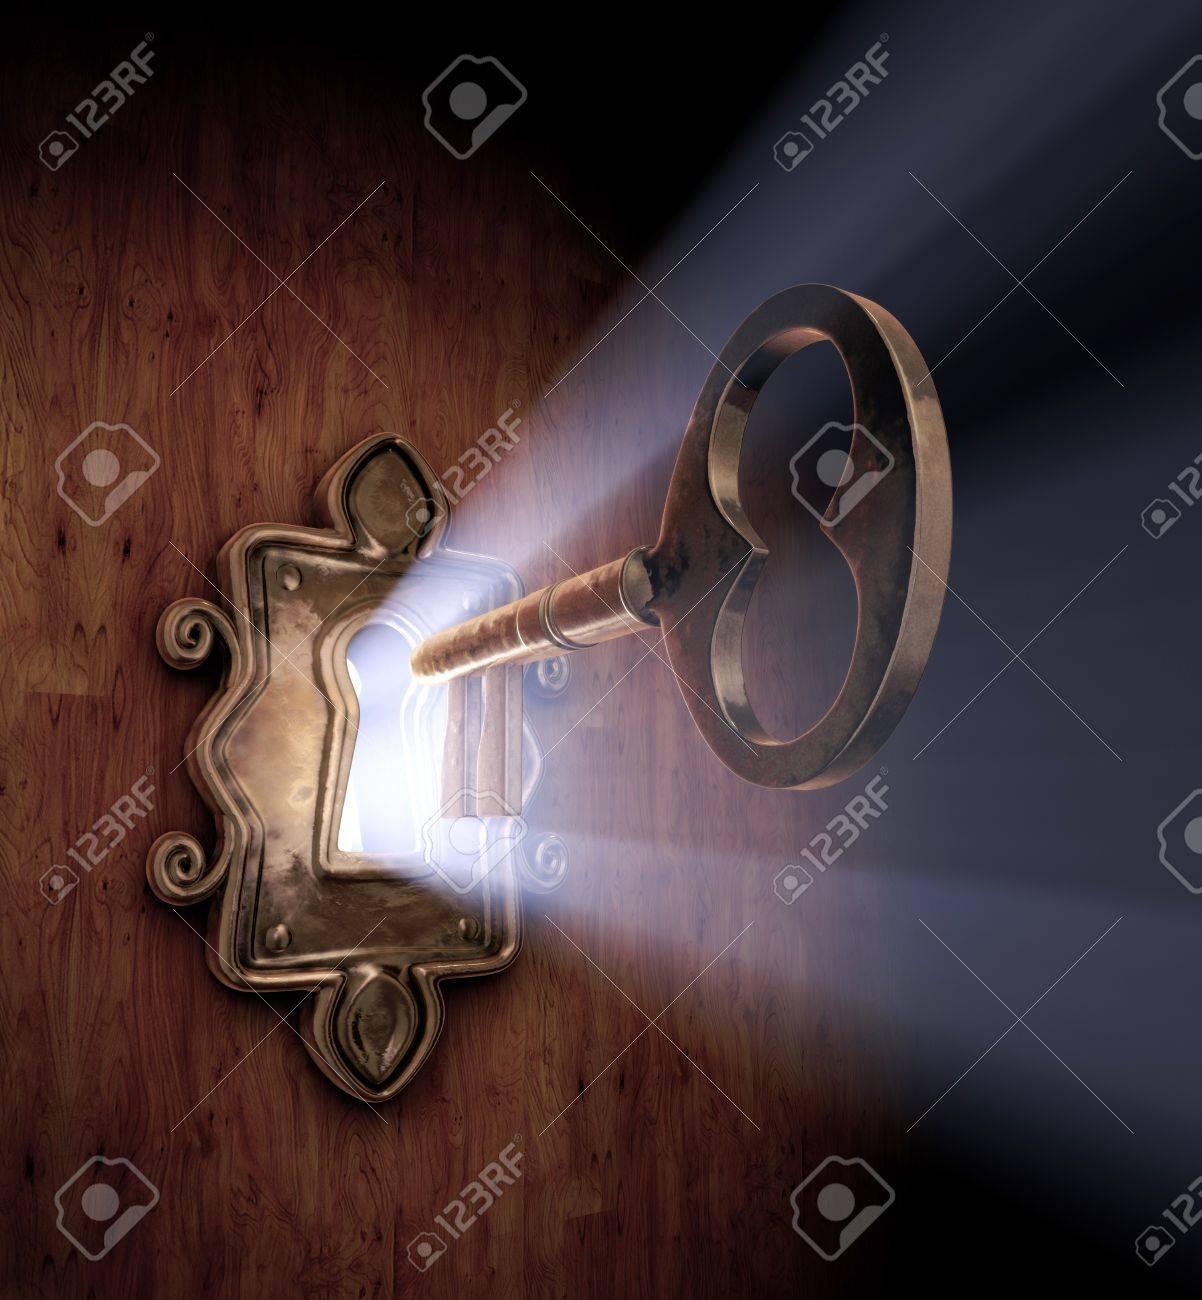 A close-up of a key moving towards the key hole. Stock Photo - 7059069